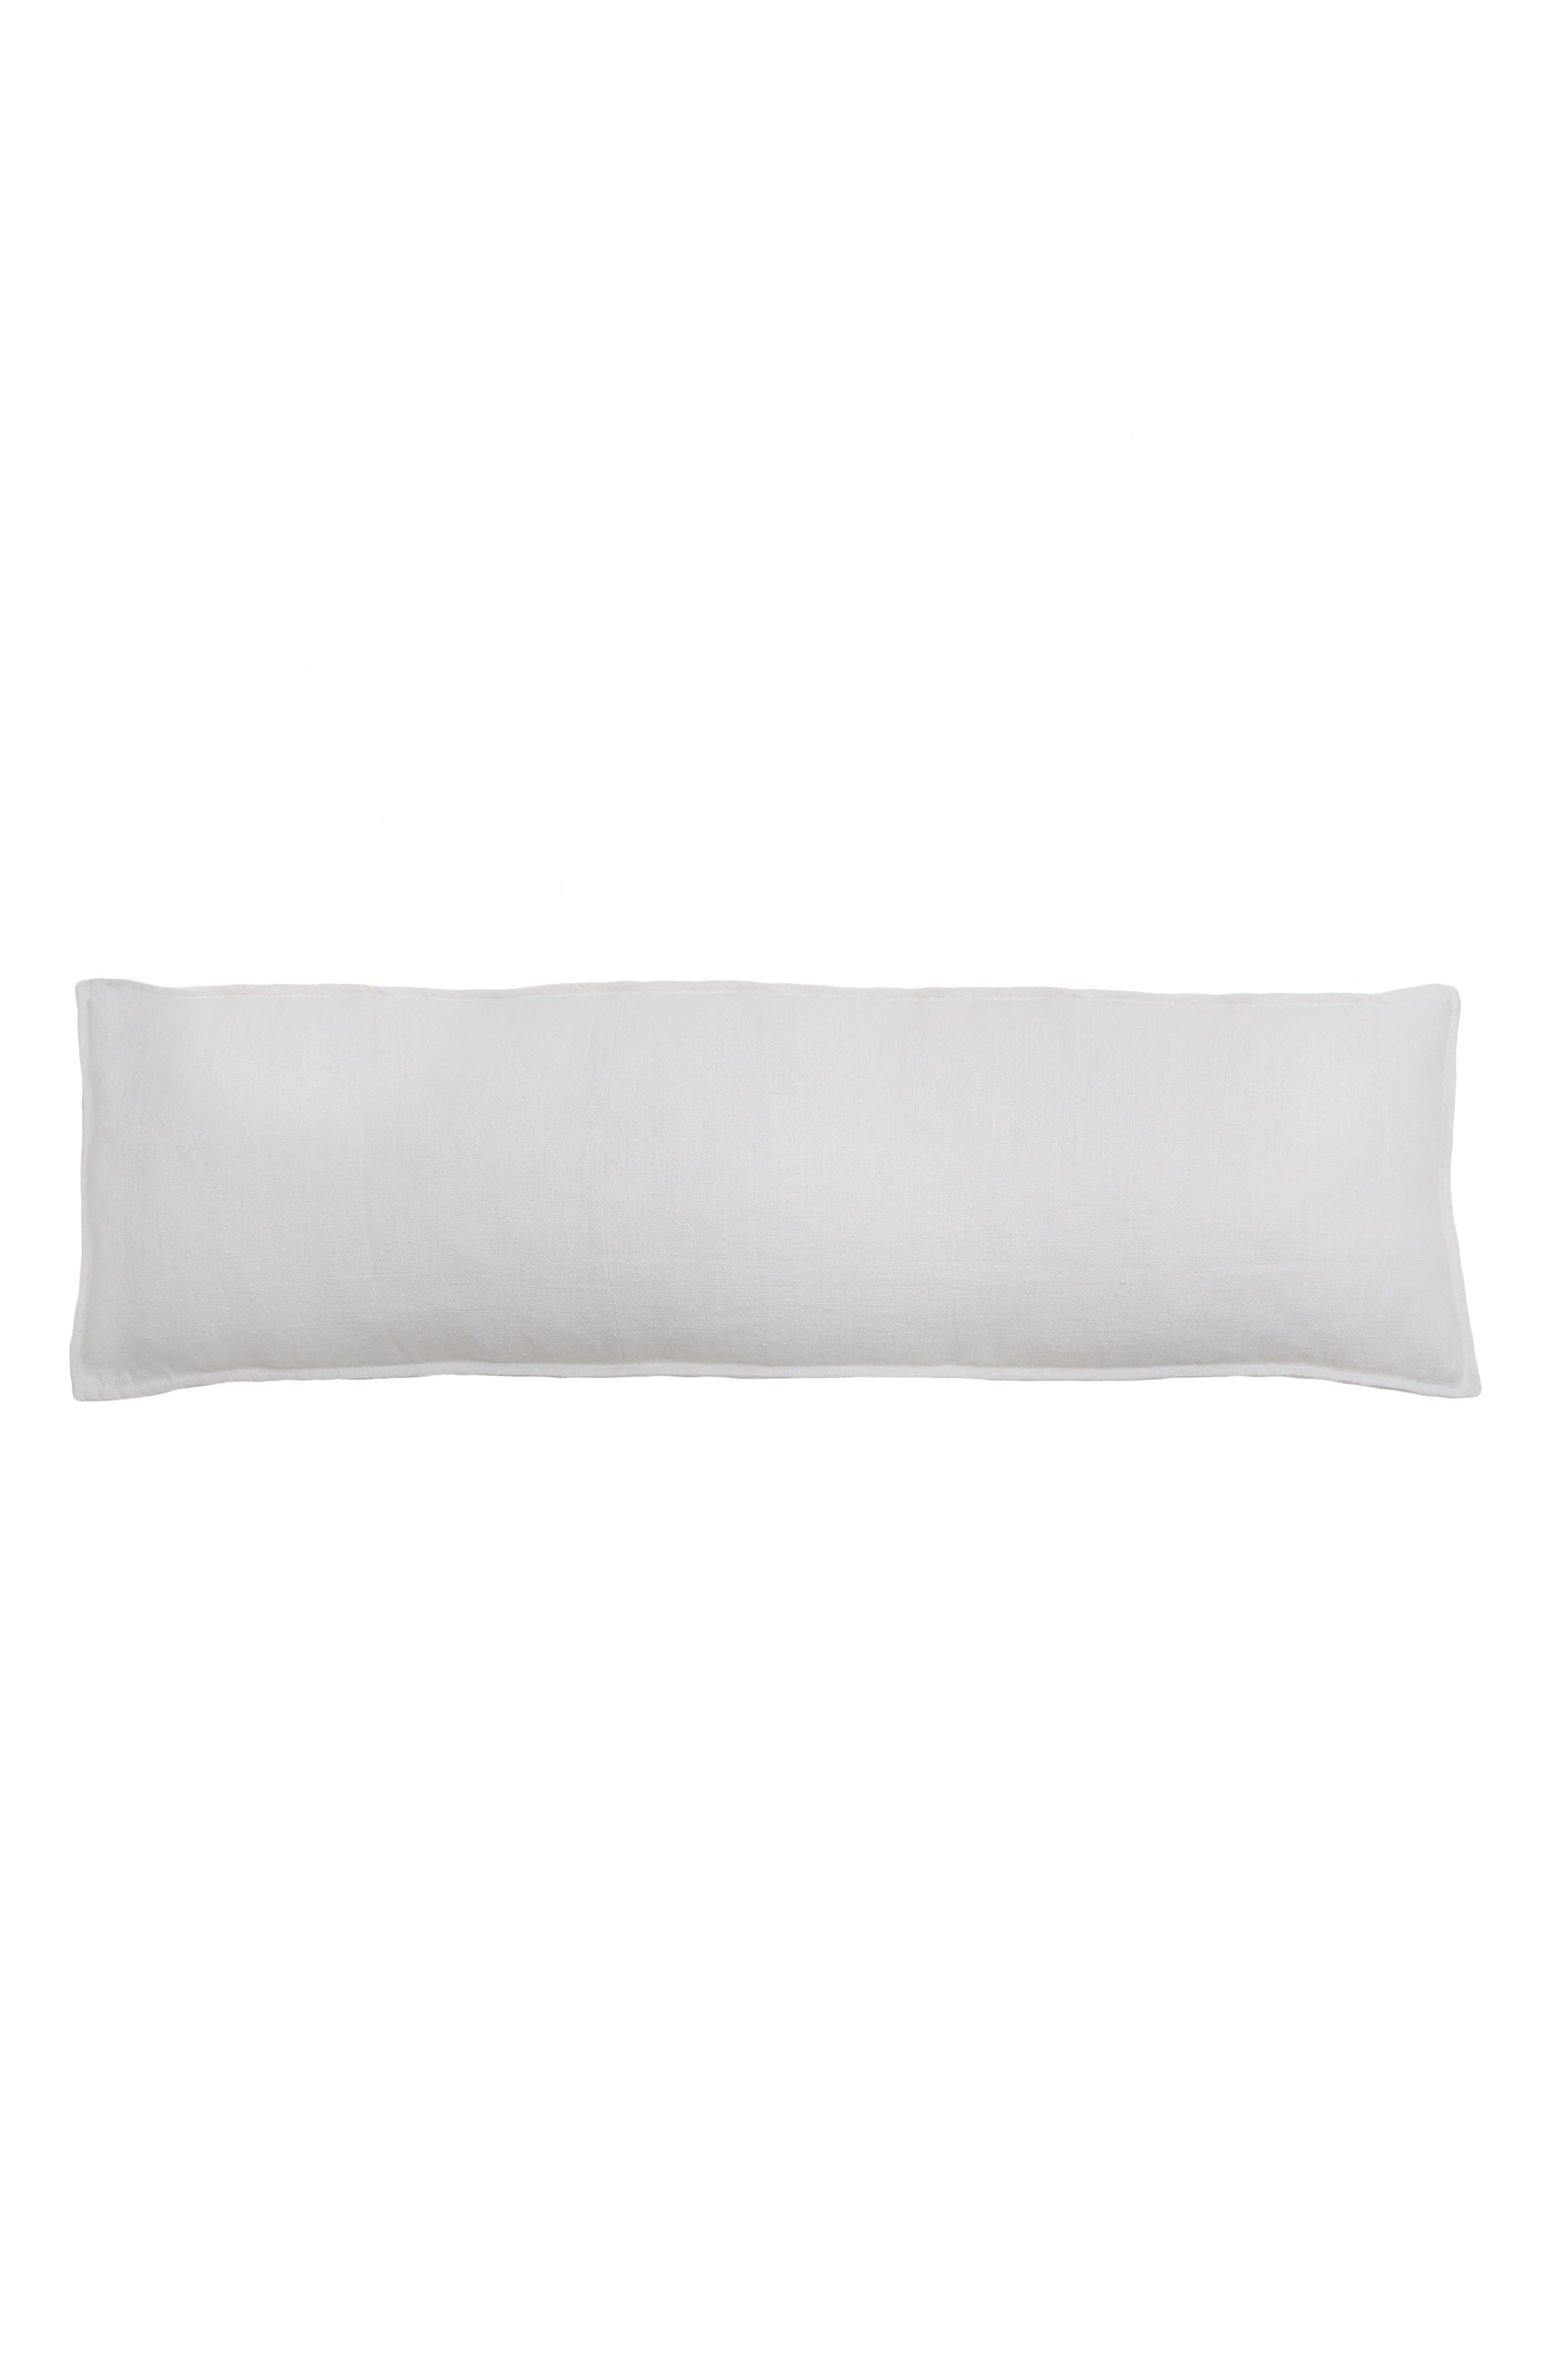 POM POM AT HOME, Montauk Body Pillow, Main thumbnail 1, color, WHITE